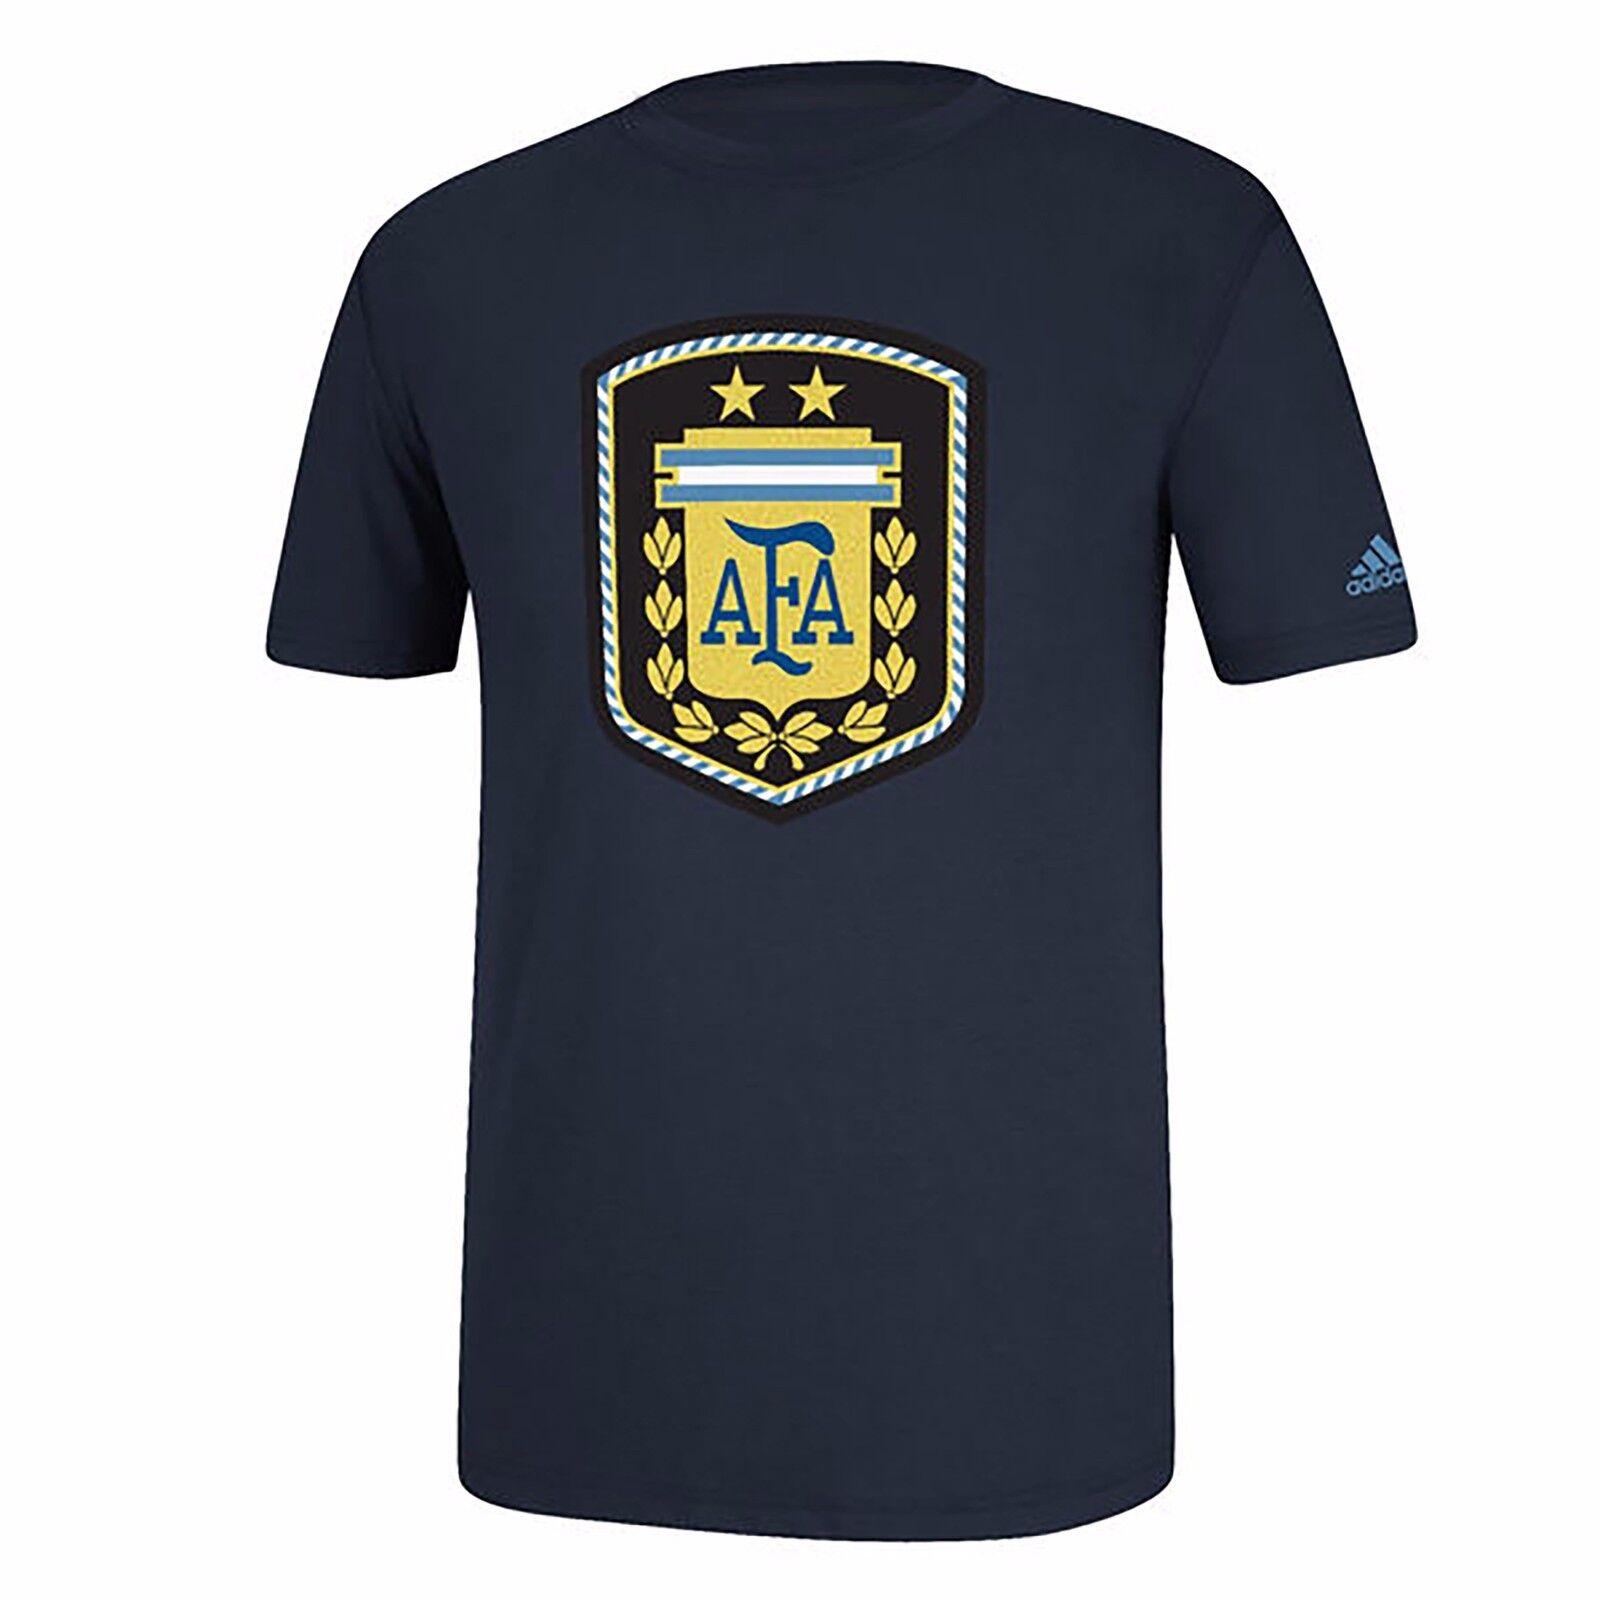 Camiseta gráfica S M L XL masculina de la AFA Argentina Selección adidas Navy FIFA